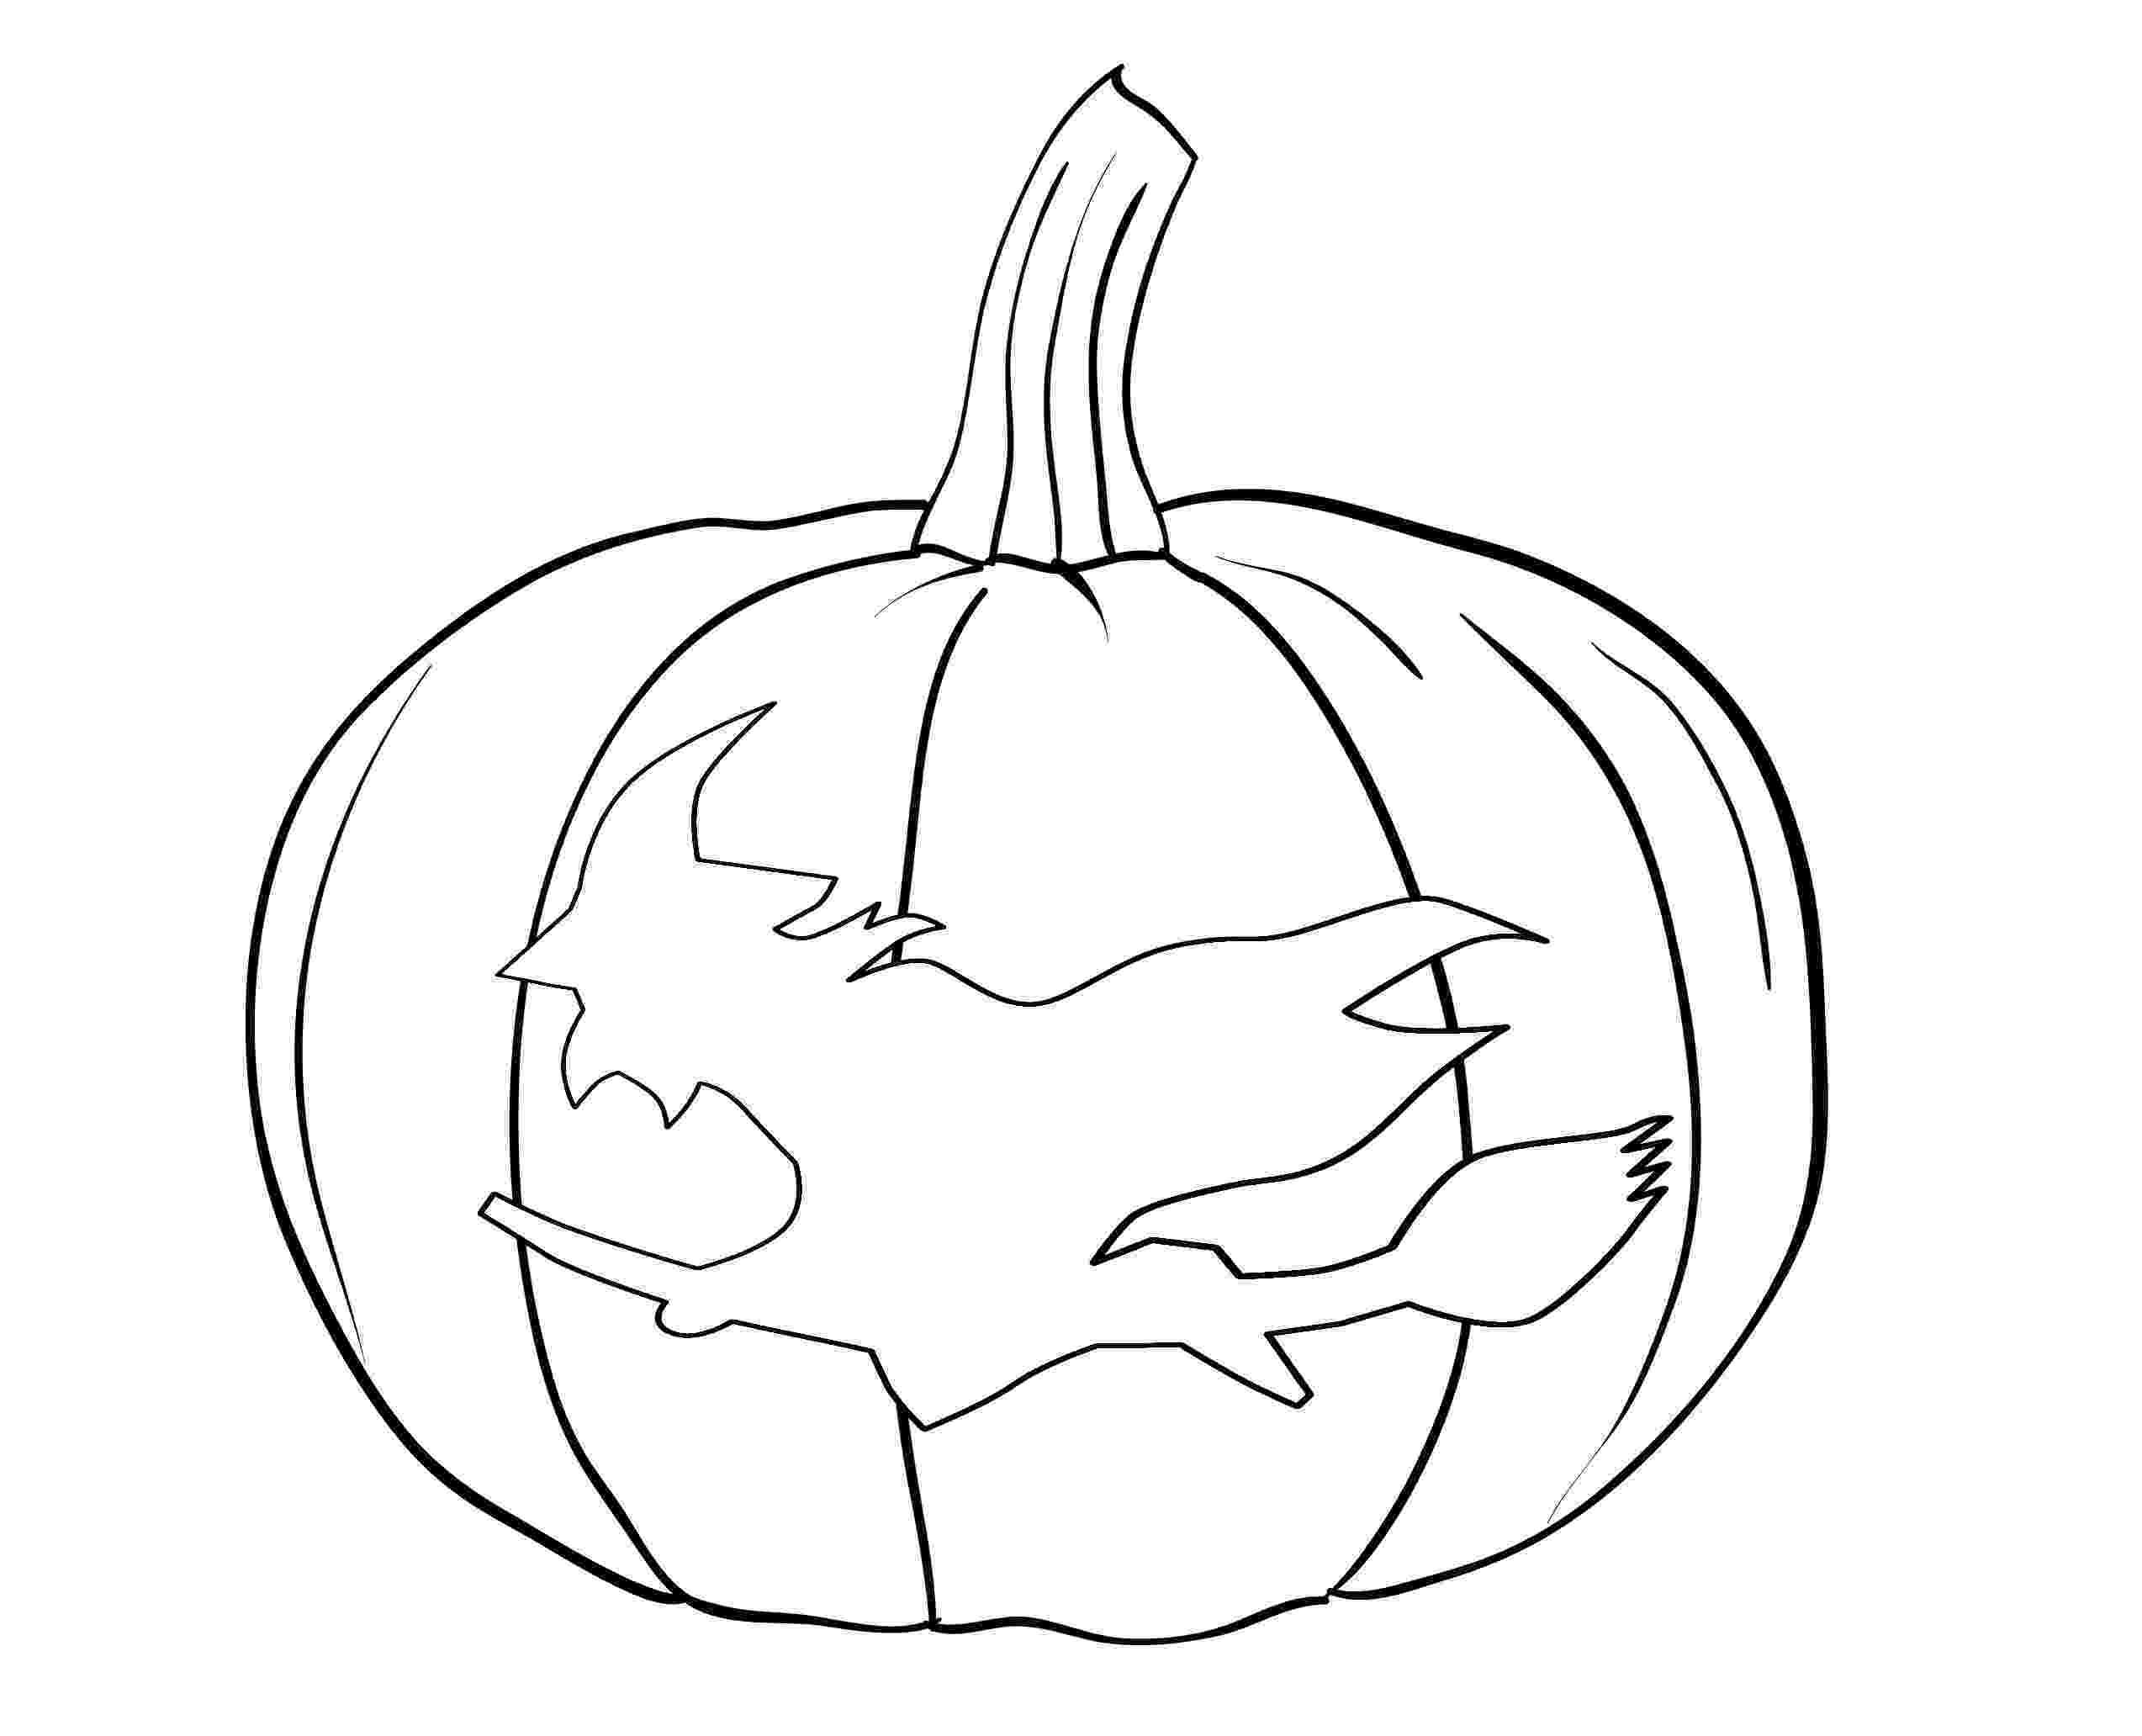 color a pumpkin free printable pumpkin coloring pages for kids pumpkin color a 1 2